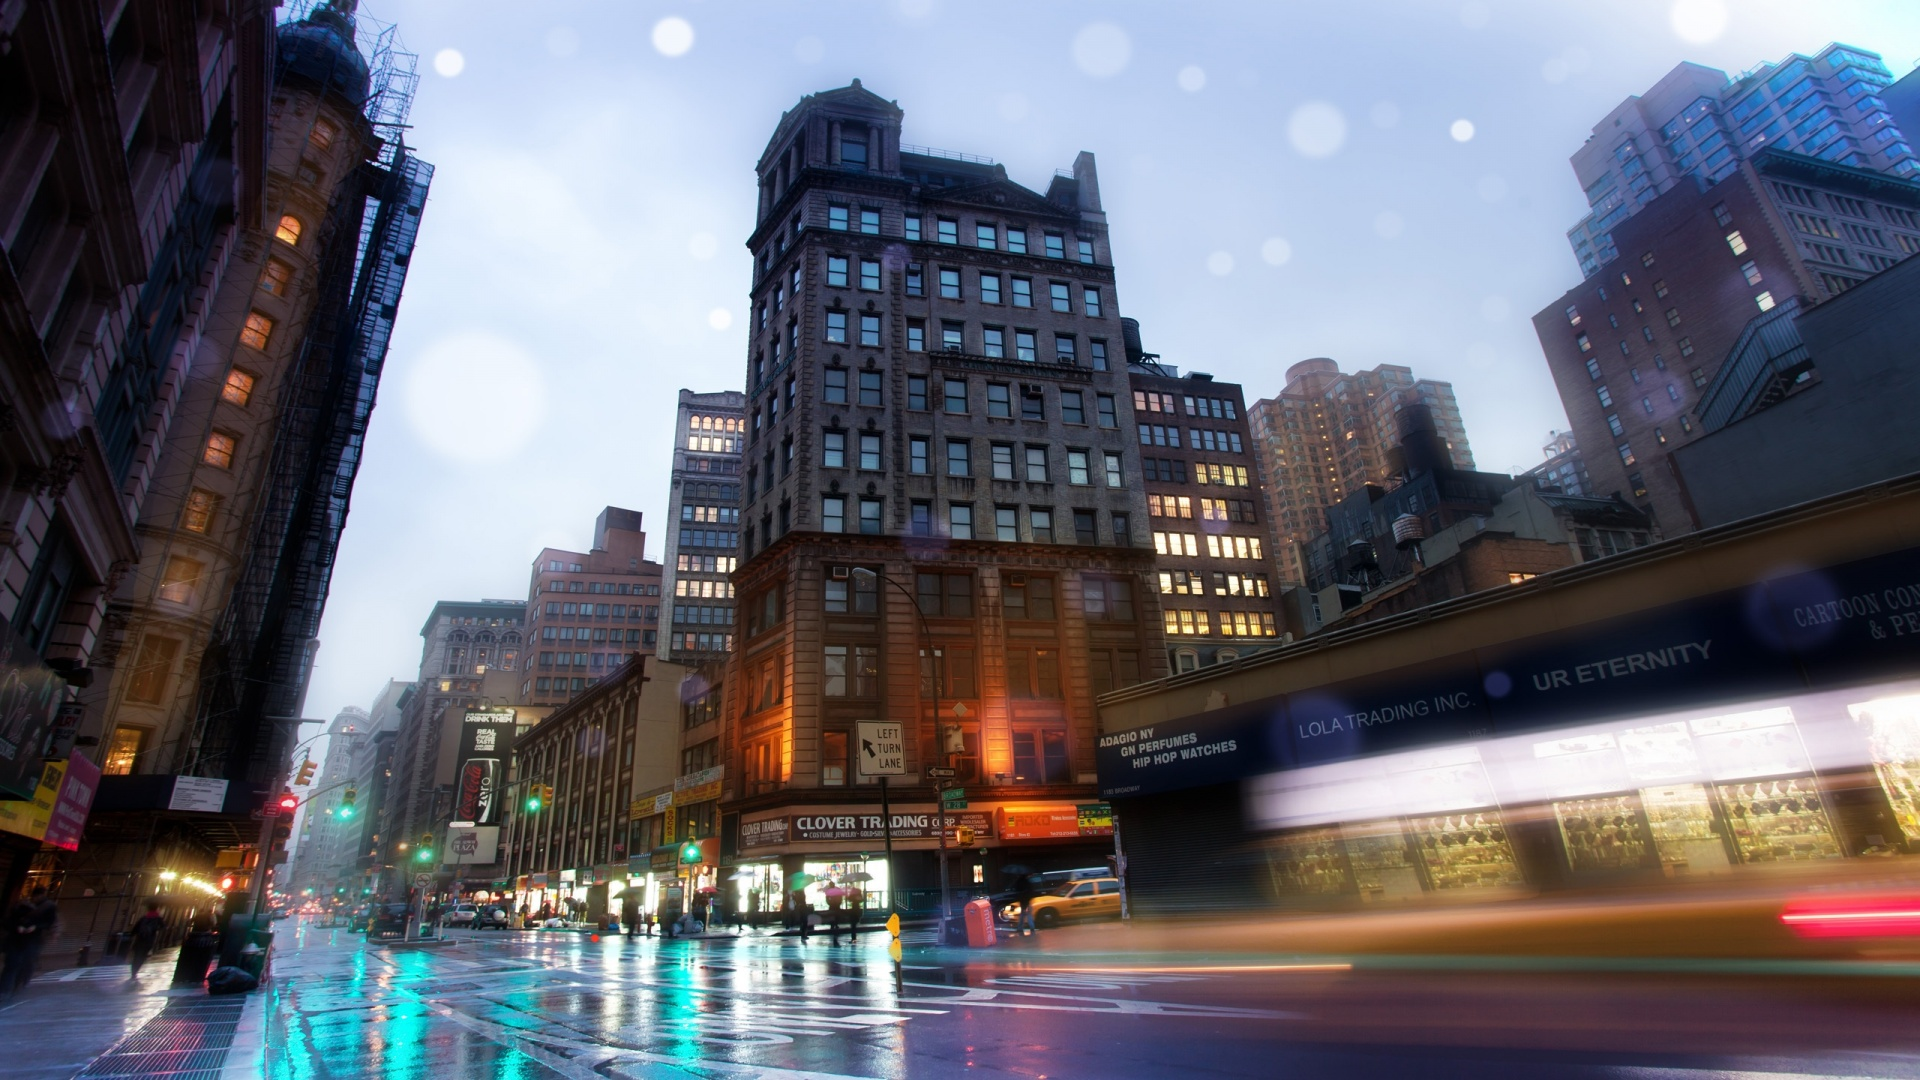 http://4.bp.blogspot.com/-IG2eoArRmz0/UIq3k9yCzVI/AAAAAAAAM7Q/Y2CPSzuCk-M/s0/new-york-broadway-street-1920x1080.jpg